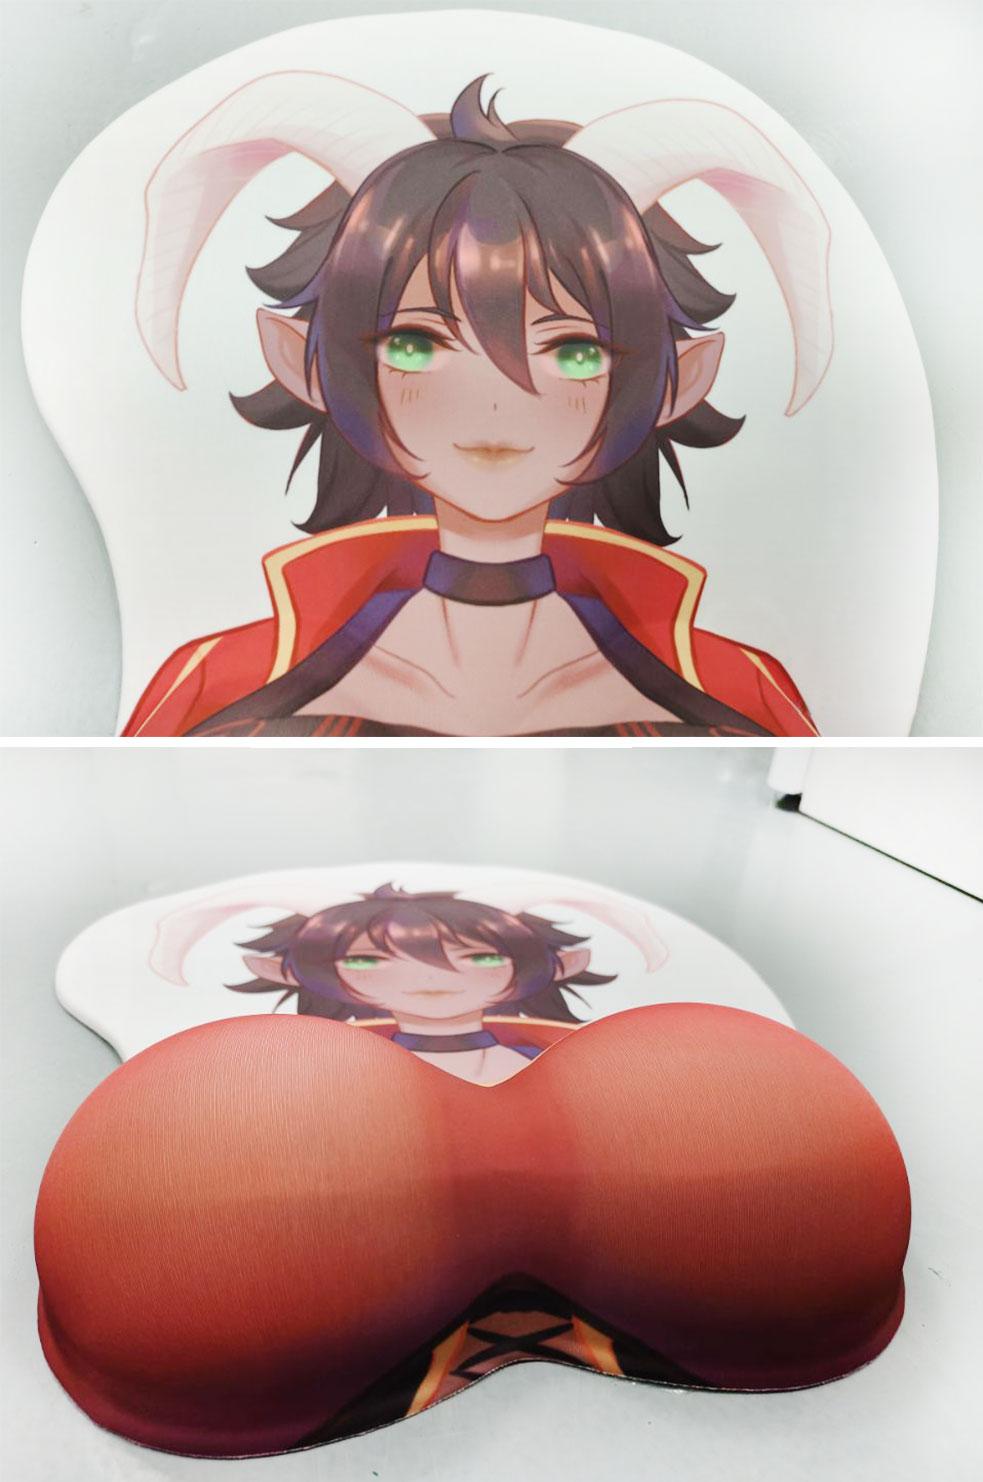 kaisa life size oppai mousepad ver1 1019 - Anime Mousepads